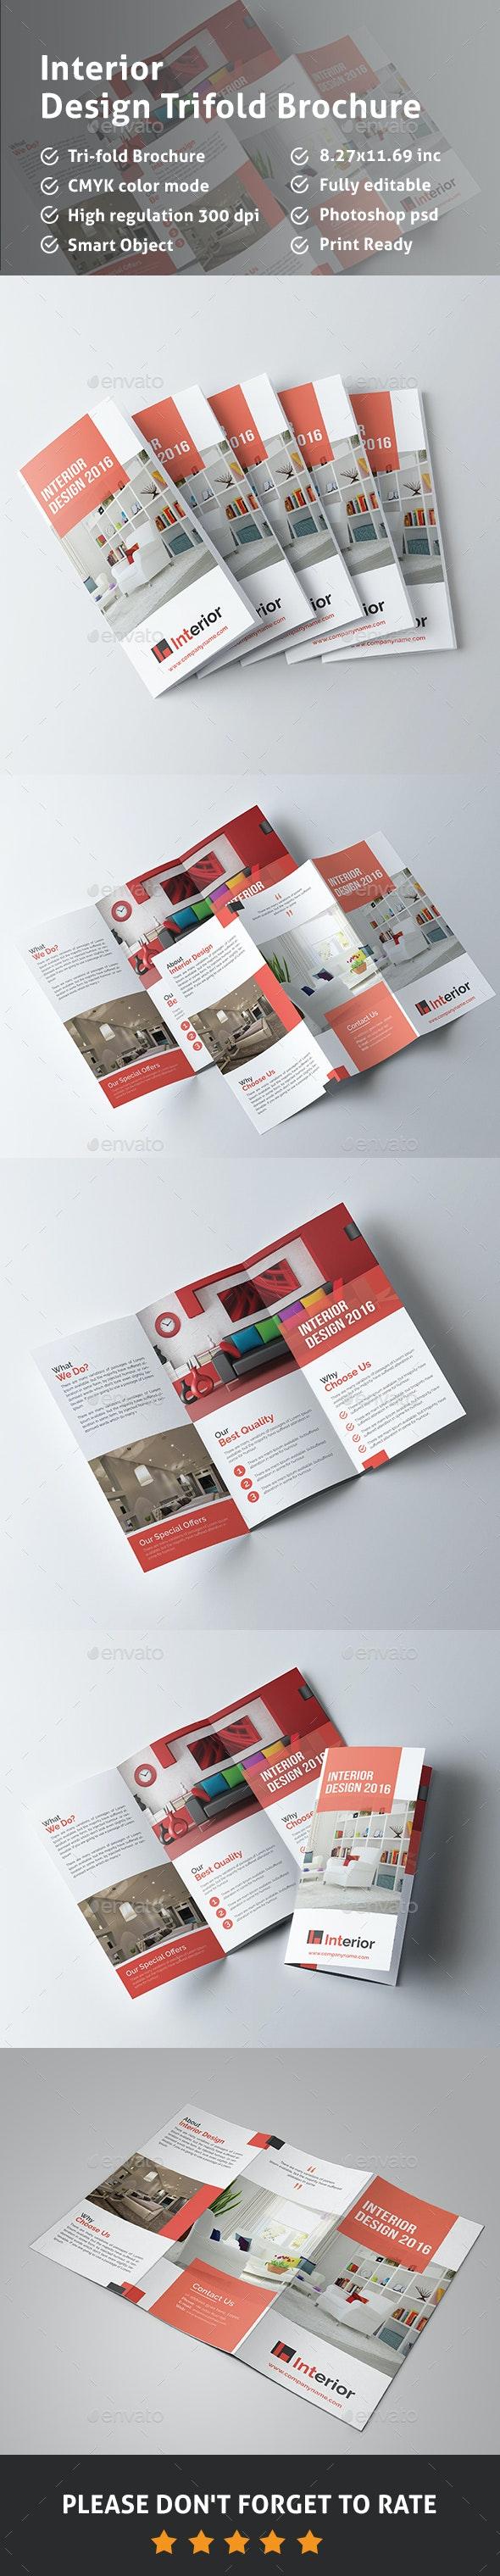 Interior Design Trifold Brochure - Corporate Brochures